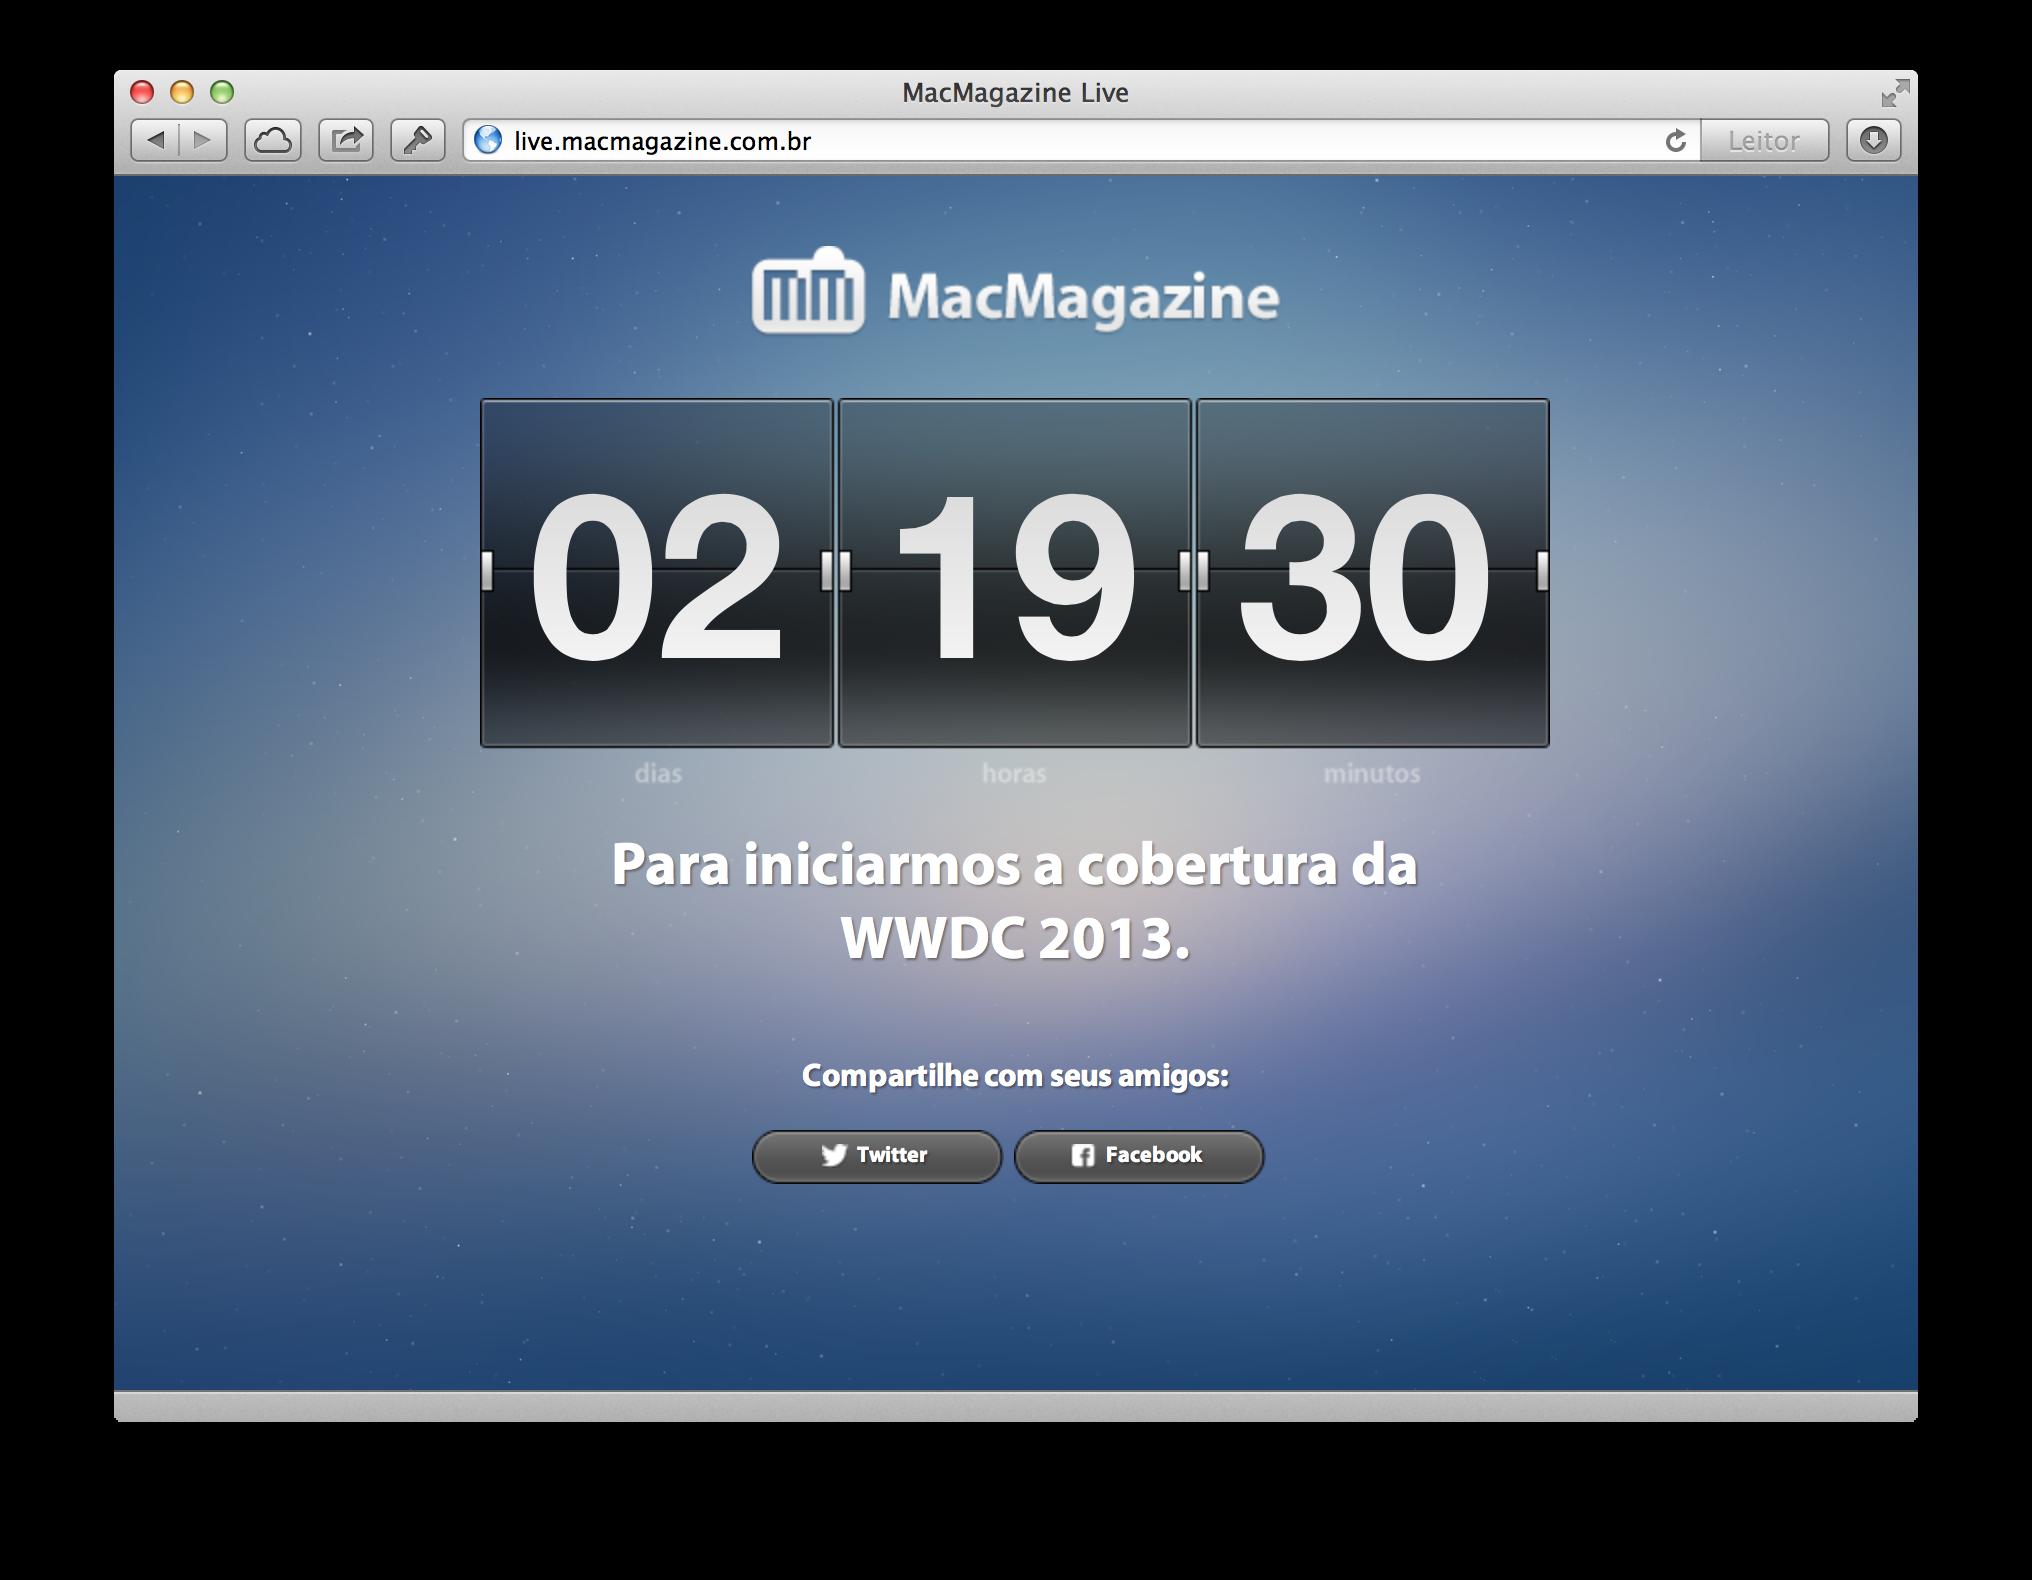 MacMagazine Live